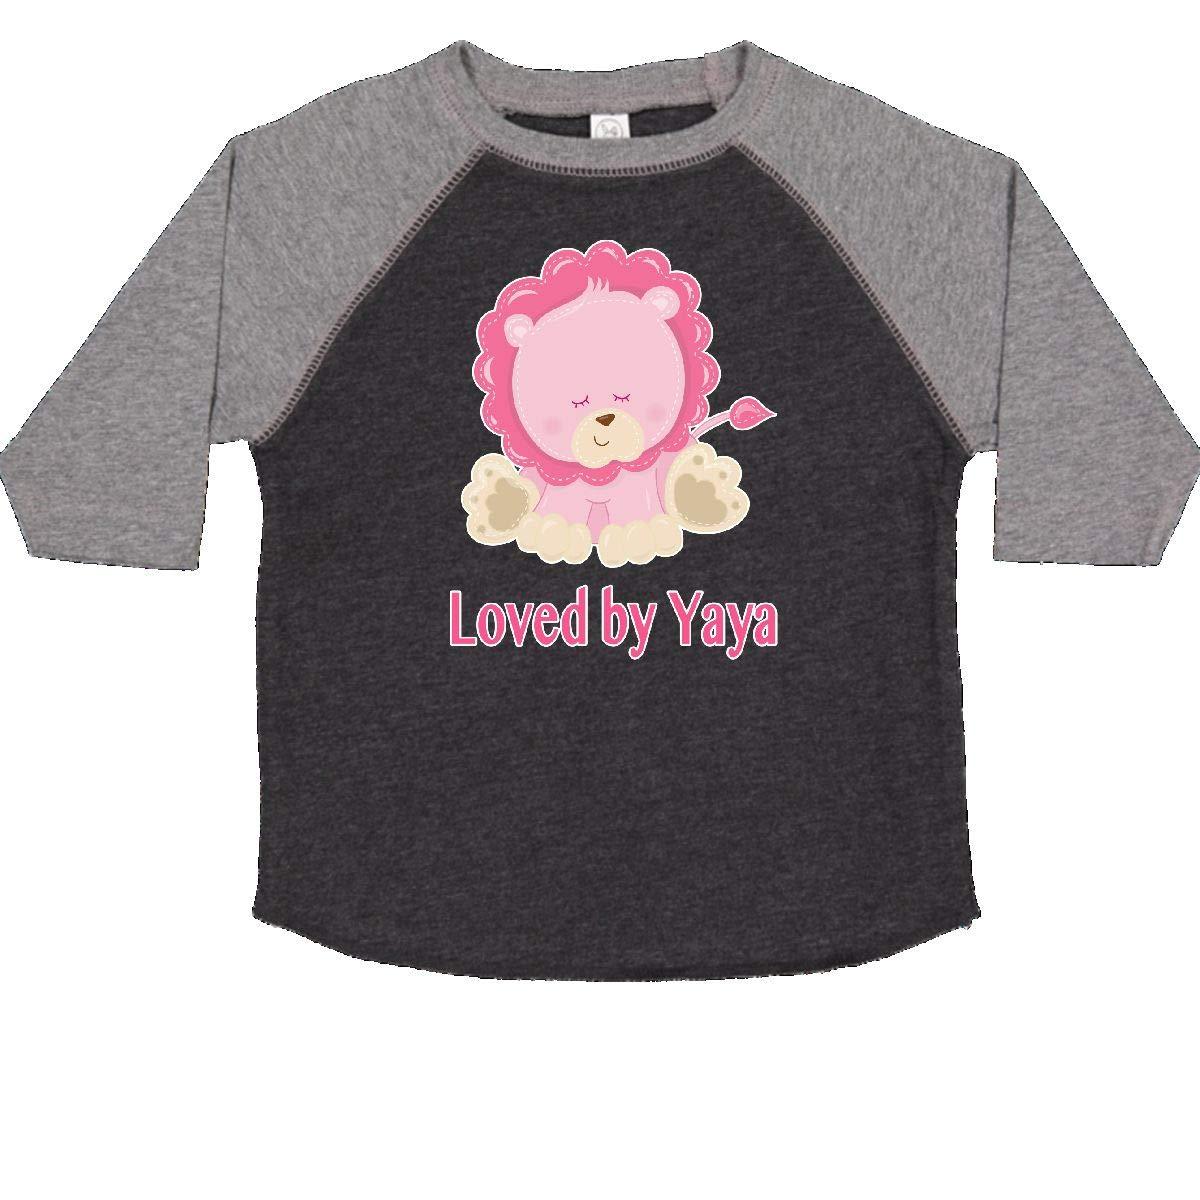 inktastic Loved by Yaya Toddler T-Shirt